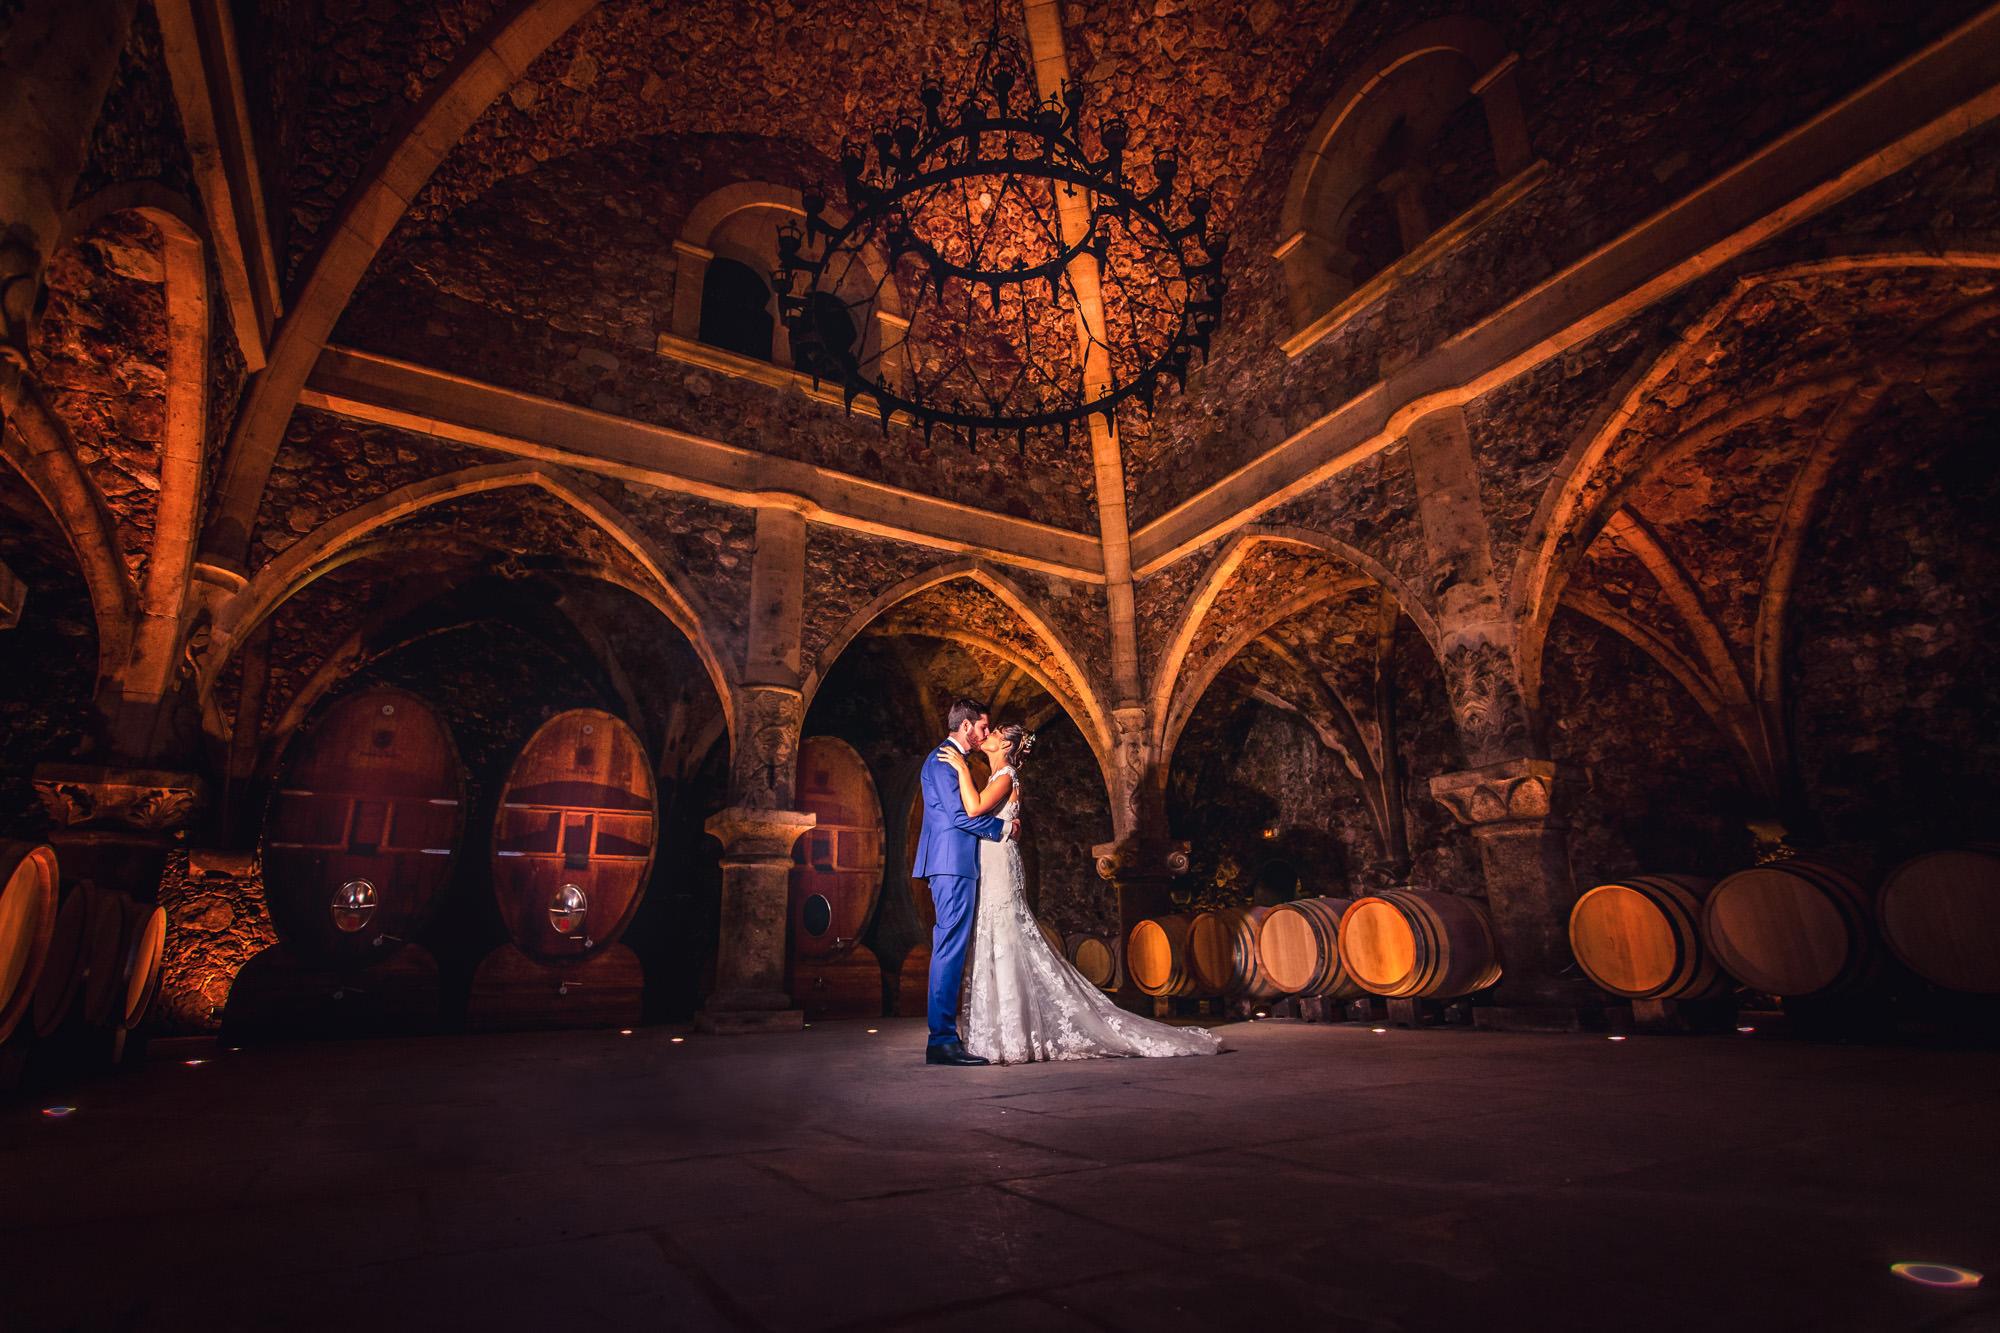 Mariage Nice Les Arcs Font du Broc Provence